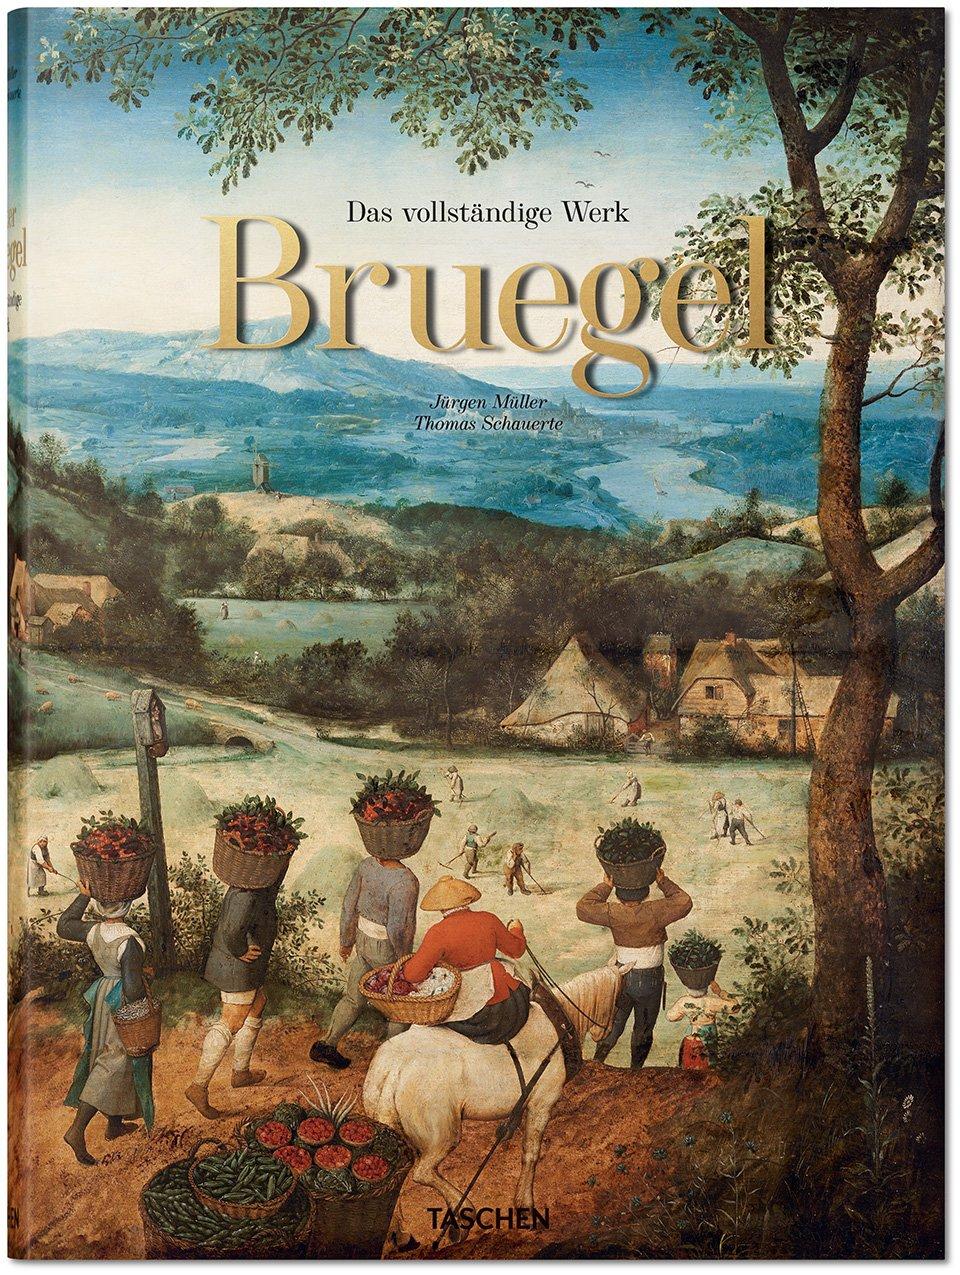 bruegel_xl_d_3d_01154_1808271644_id_1204058